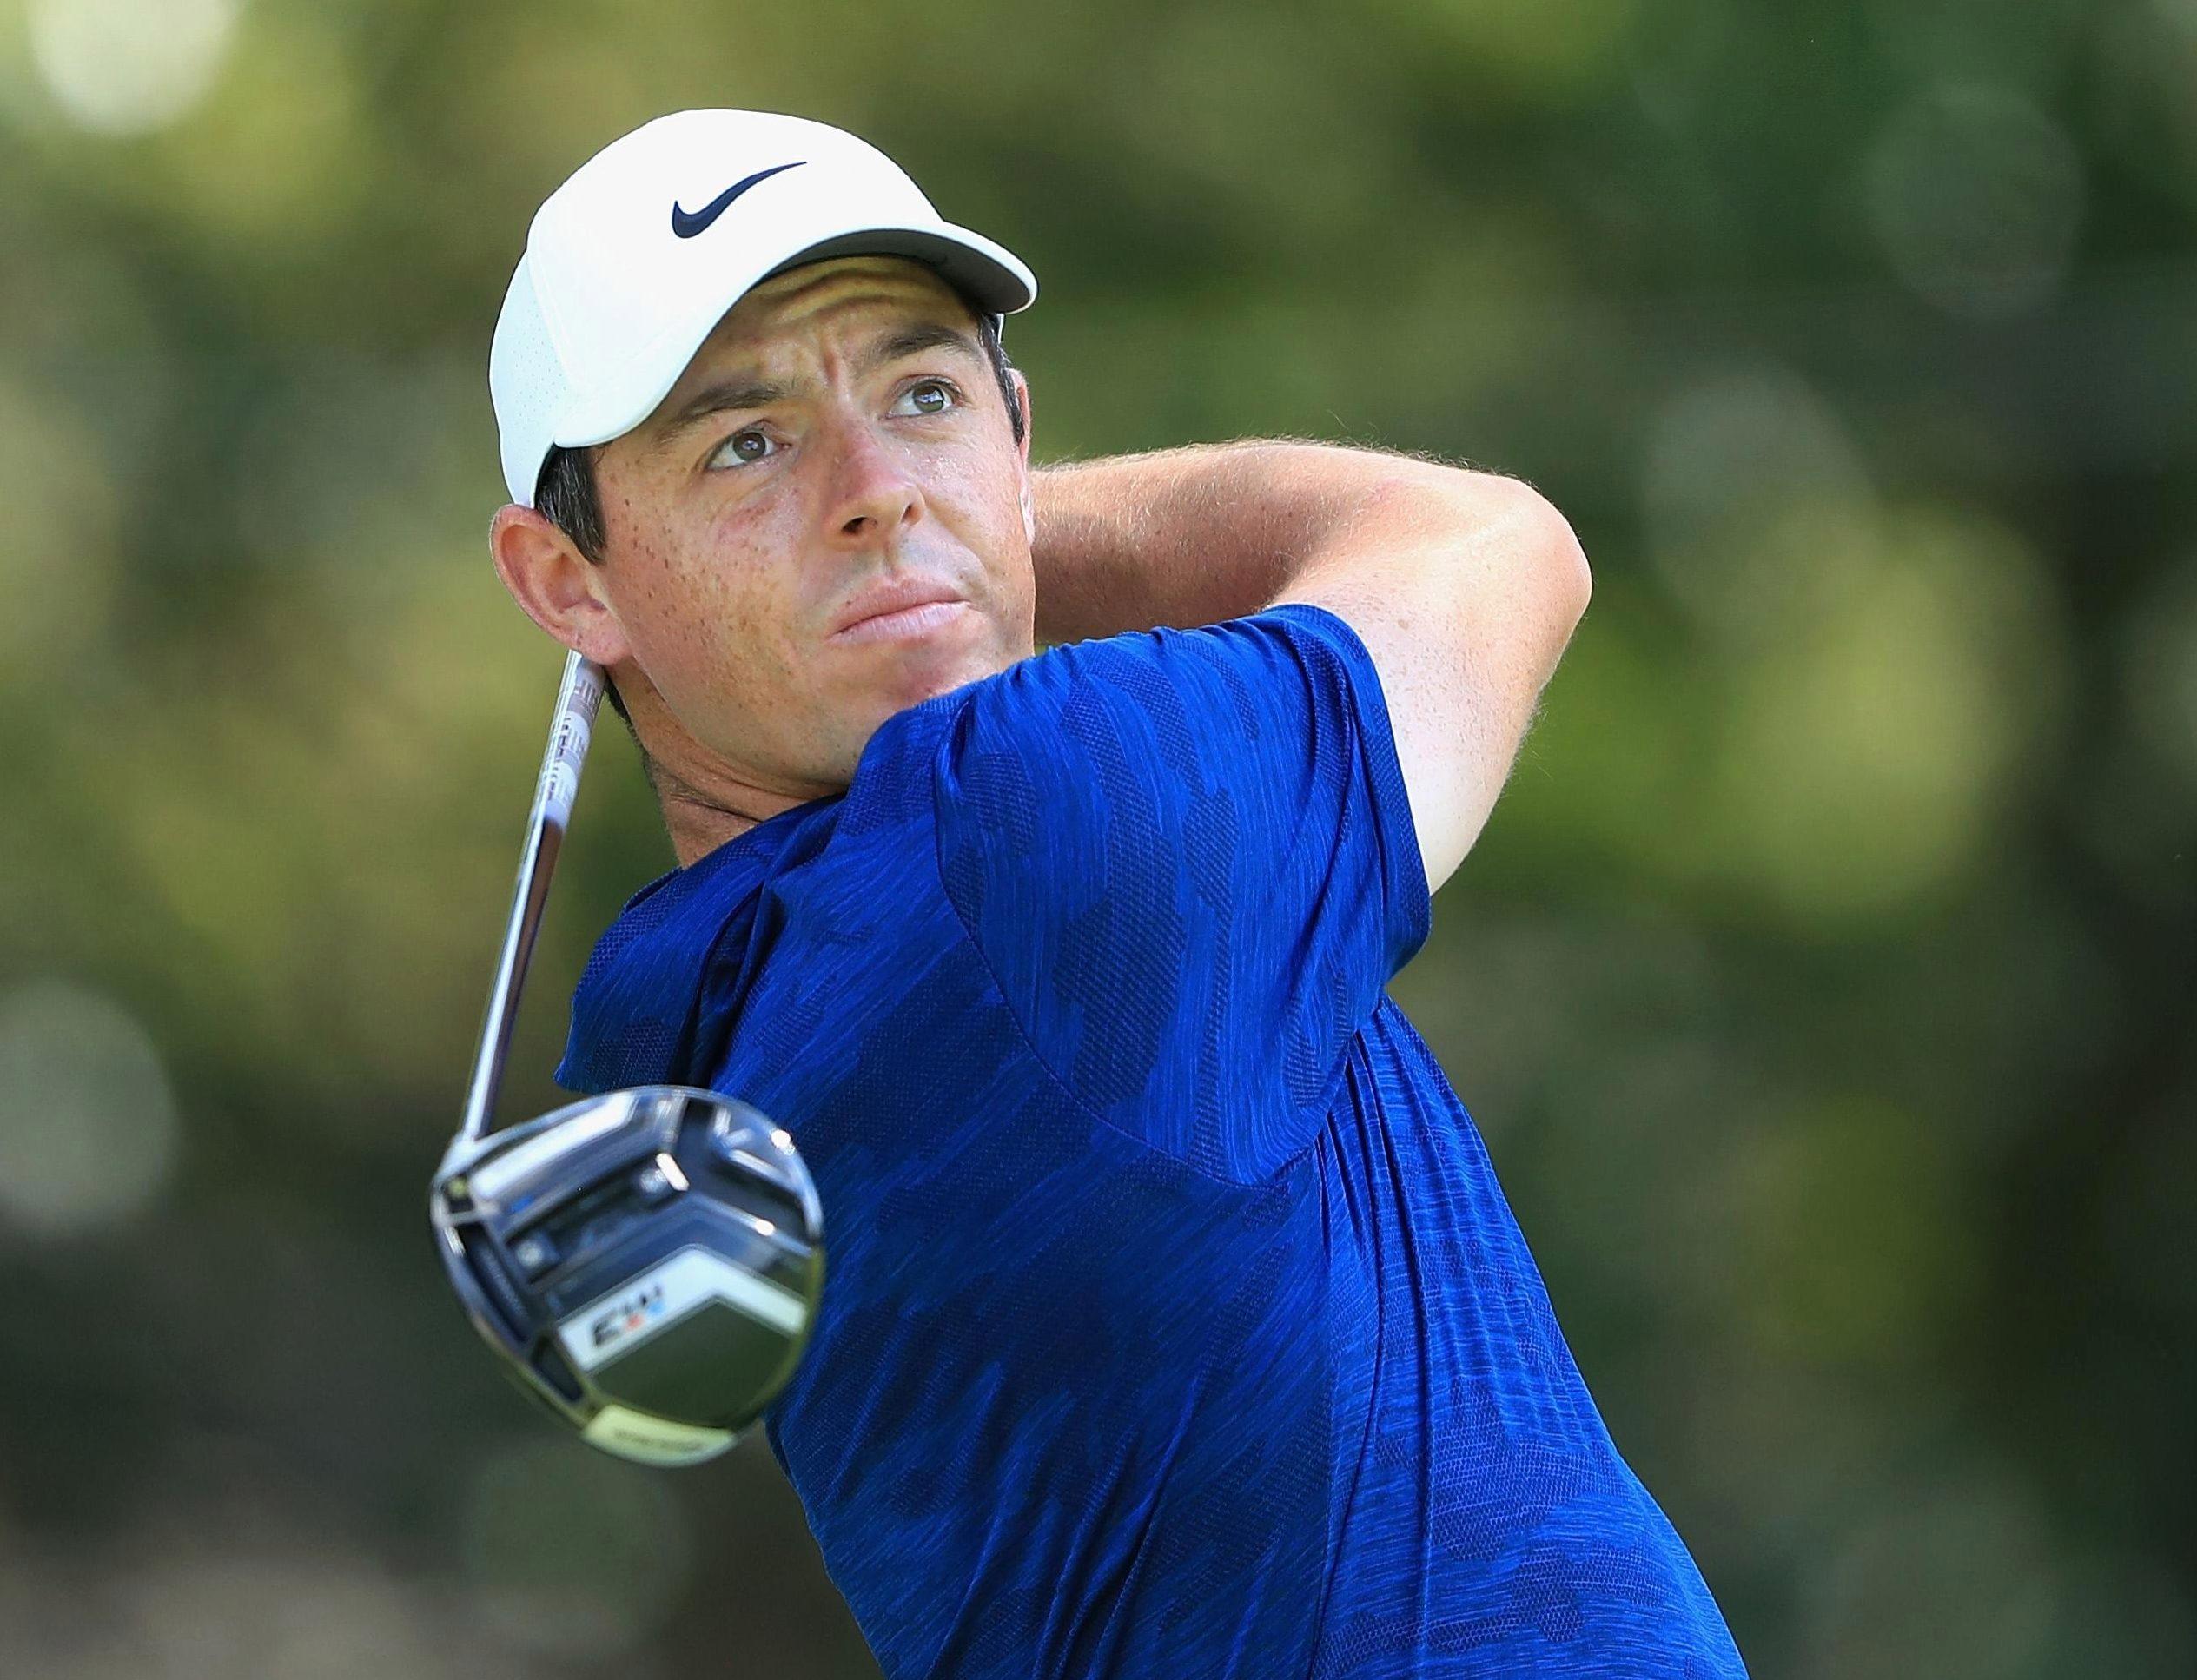 Rory McIlroy has won four golf majors